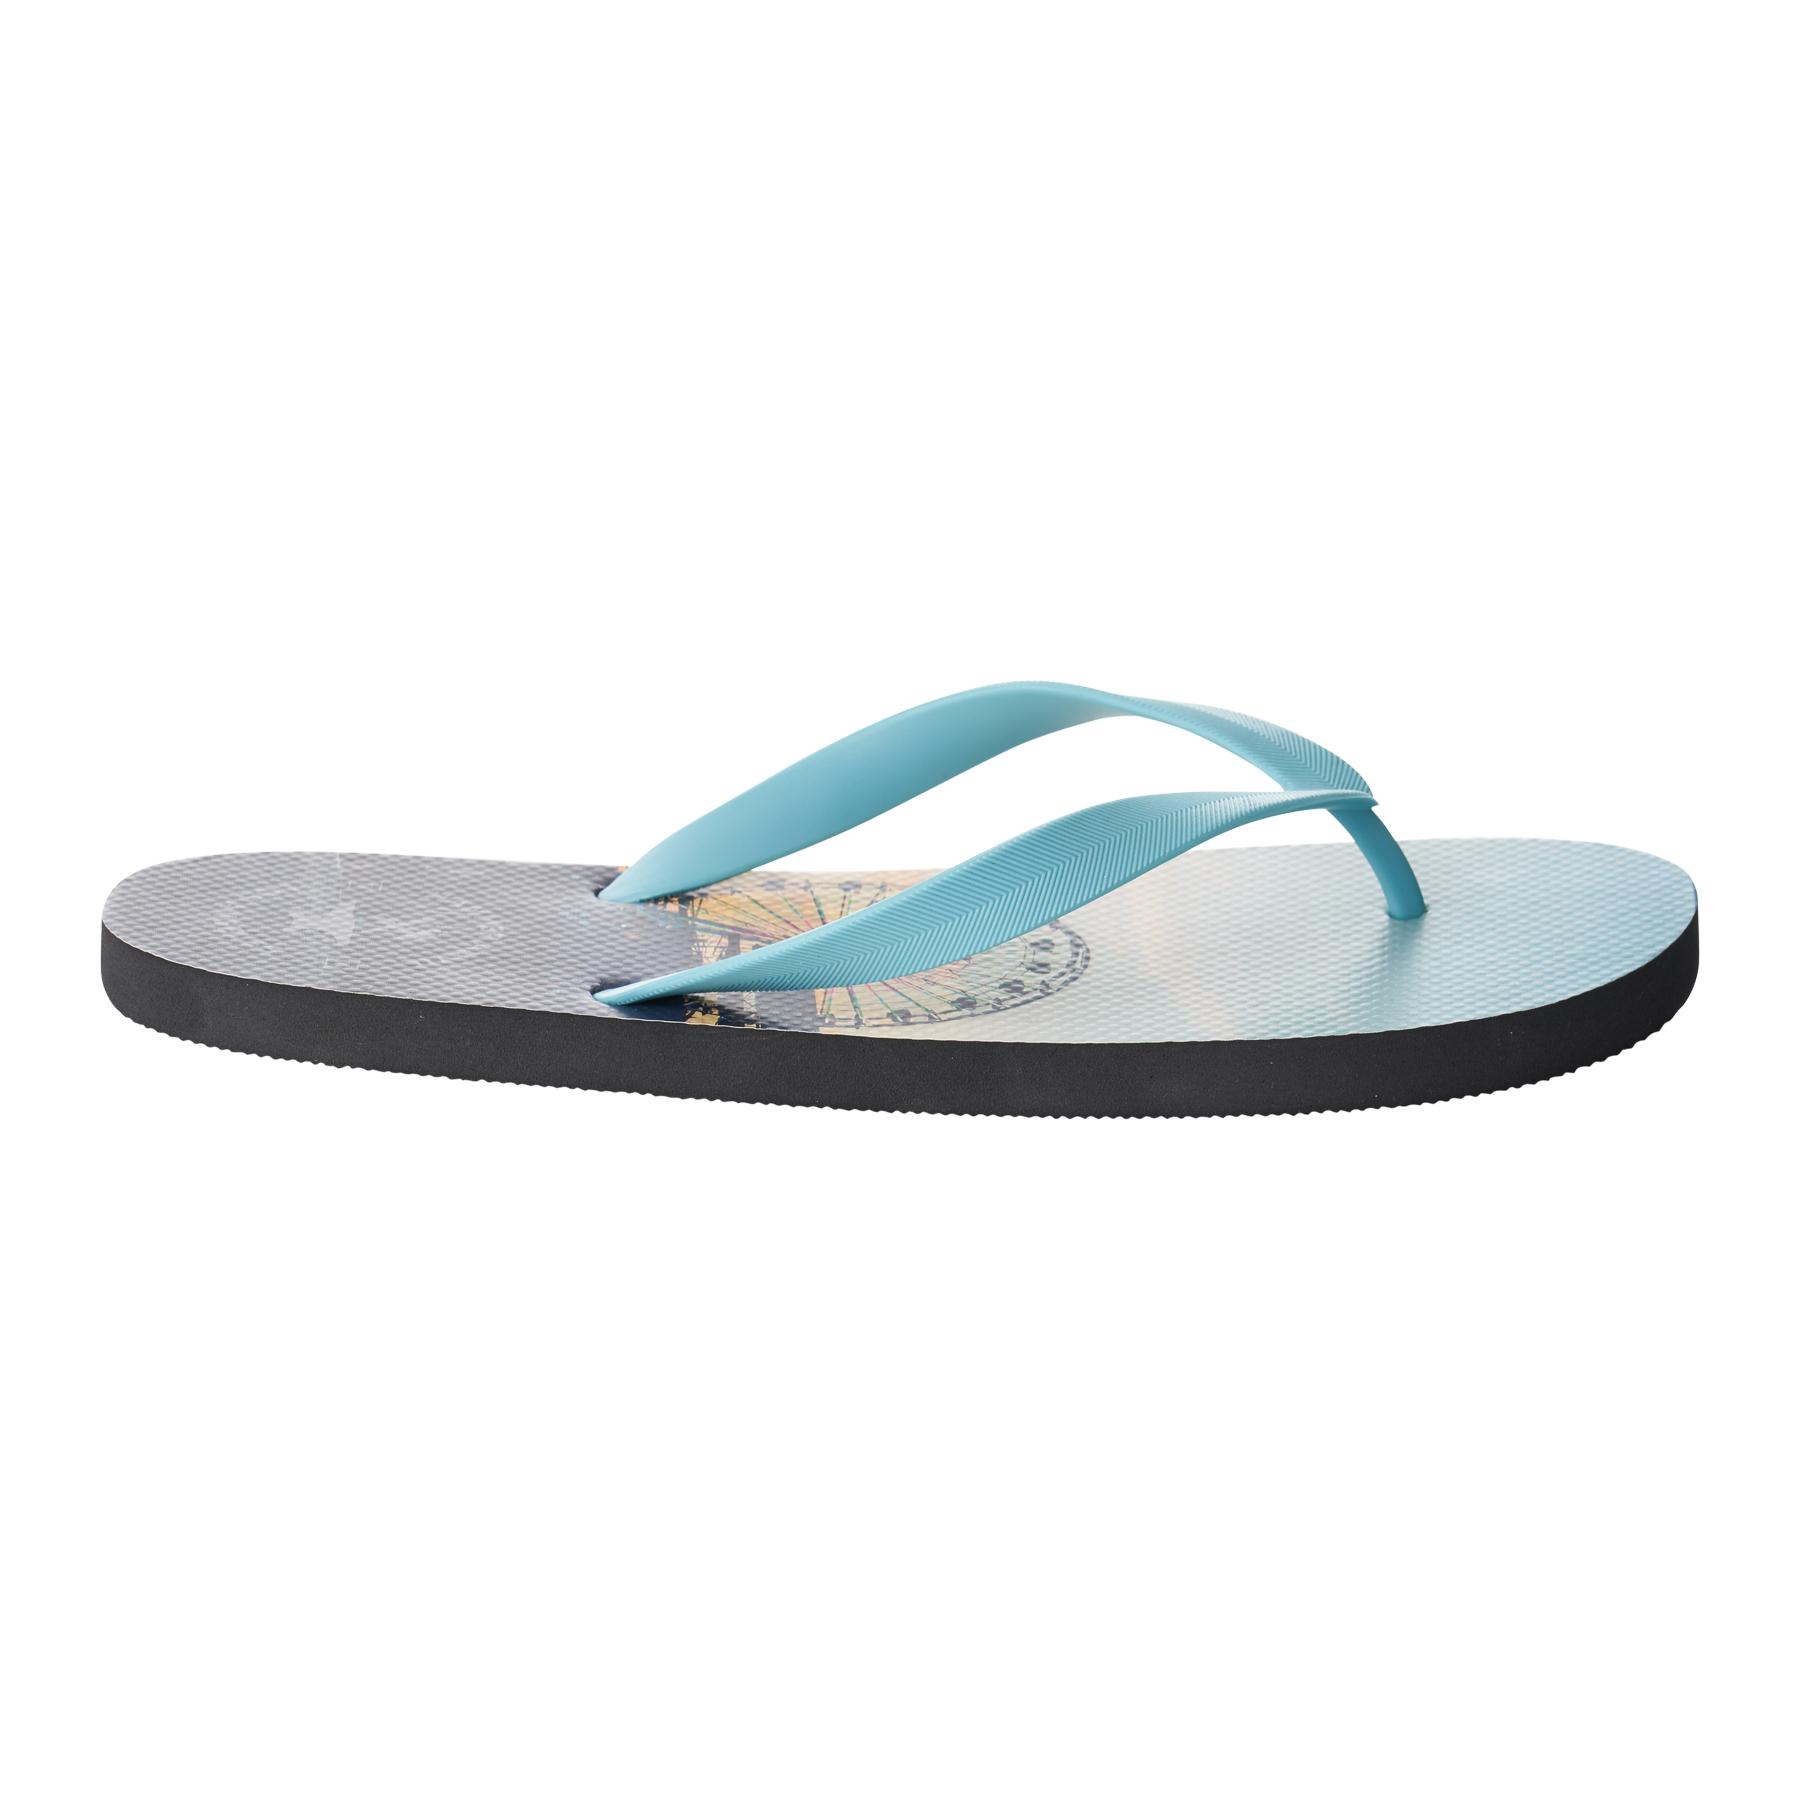 Hammer-Anvil-Mens-Flip-Flops-Casual-Thong-Summer-Sandals-Comfortable-Beach-Shoes thumbnail 25